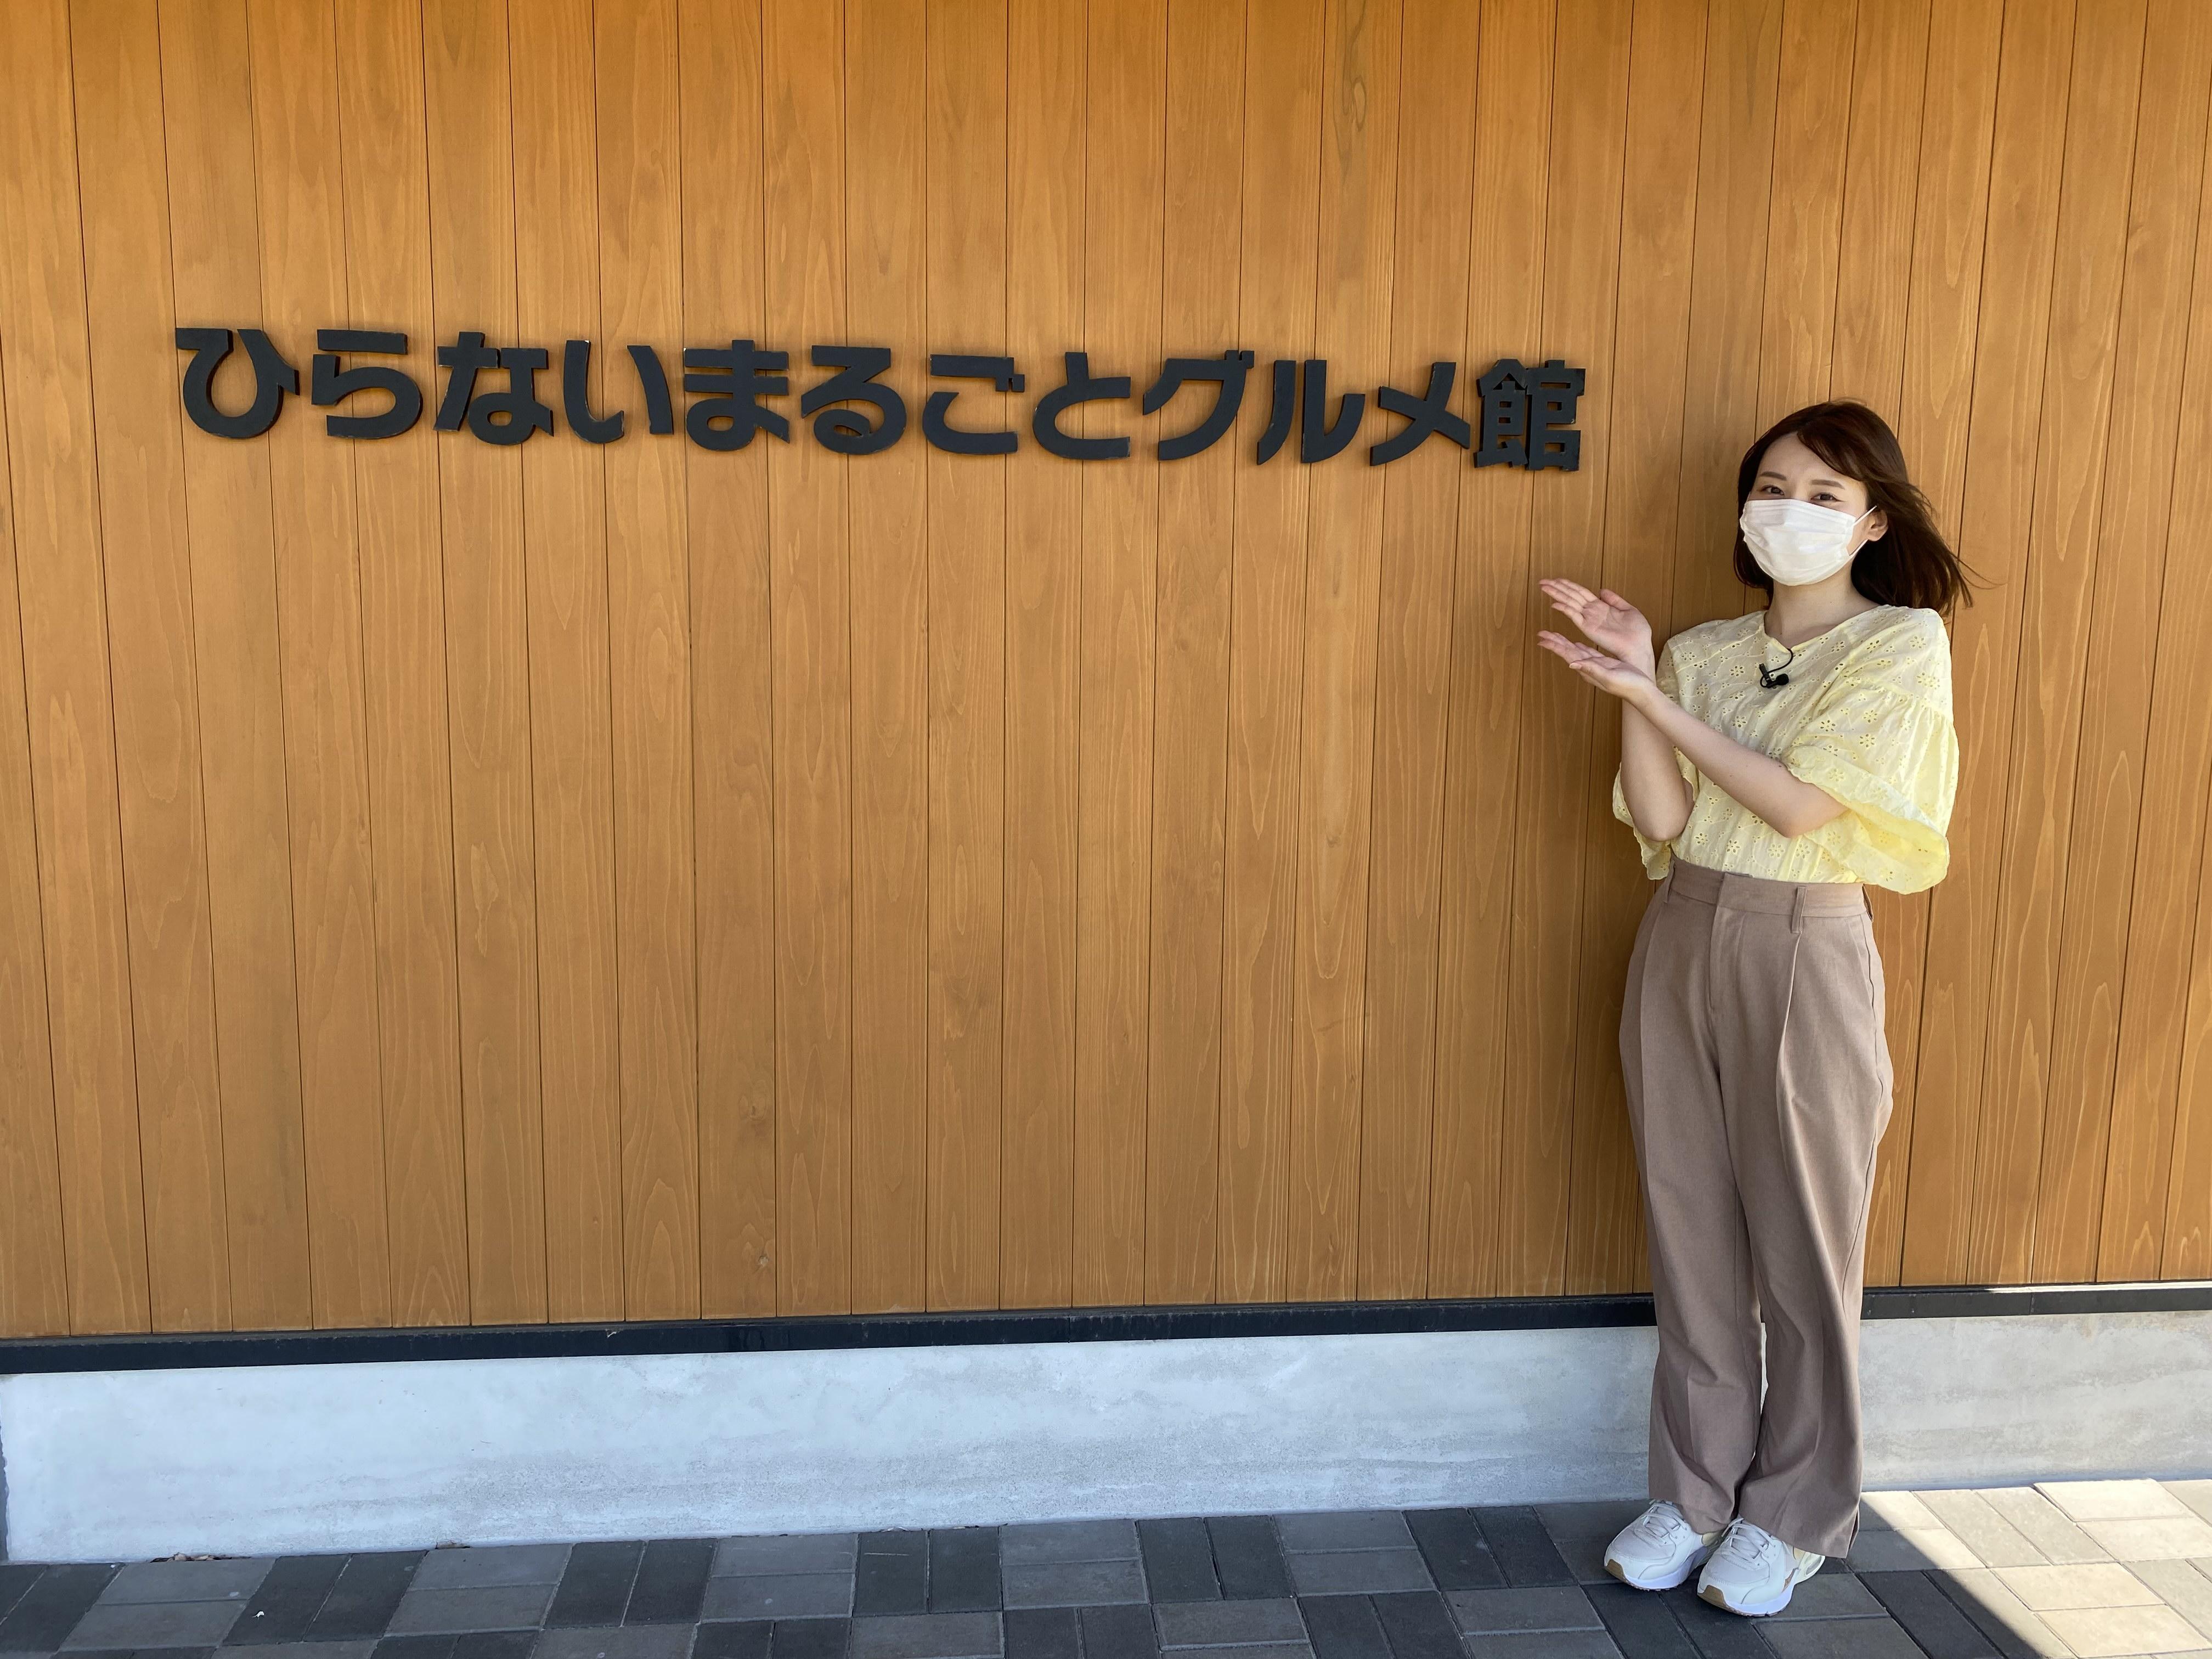 image_50375937.JPG